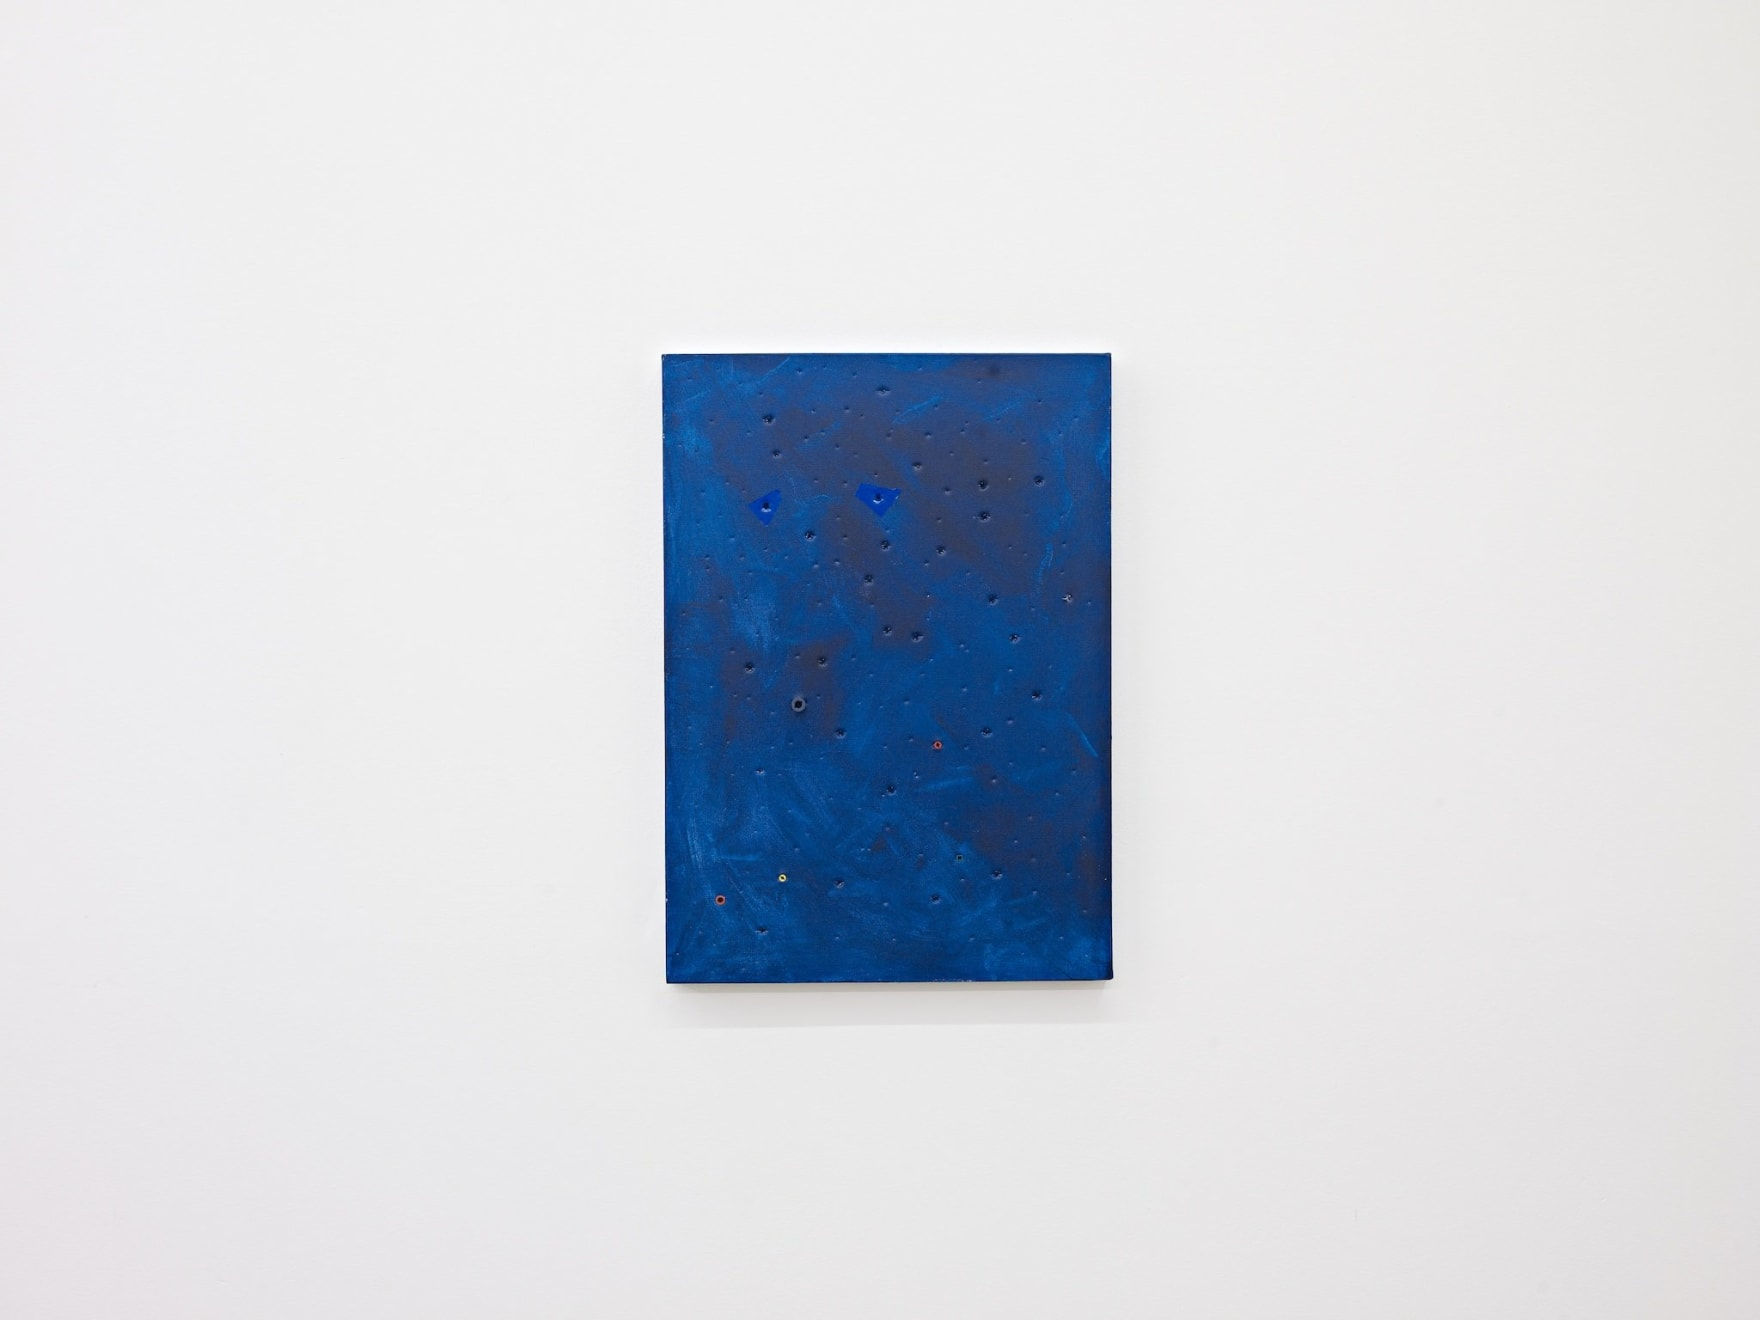 Jennifer Douglas, If walls had eyes, 2012